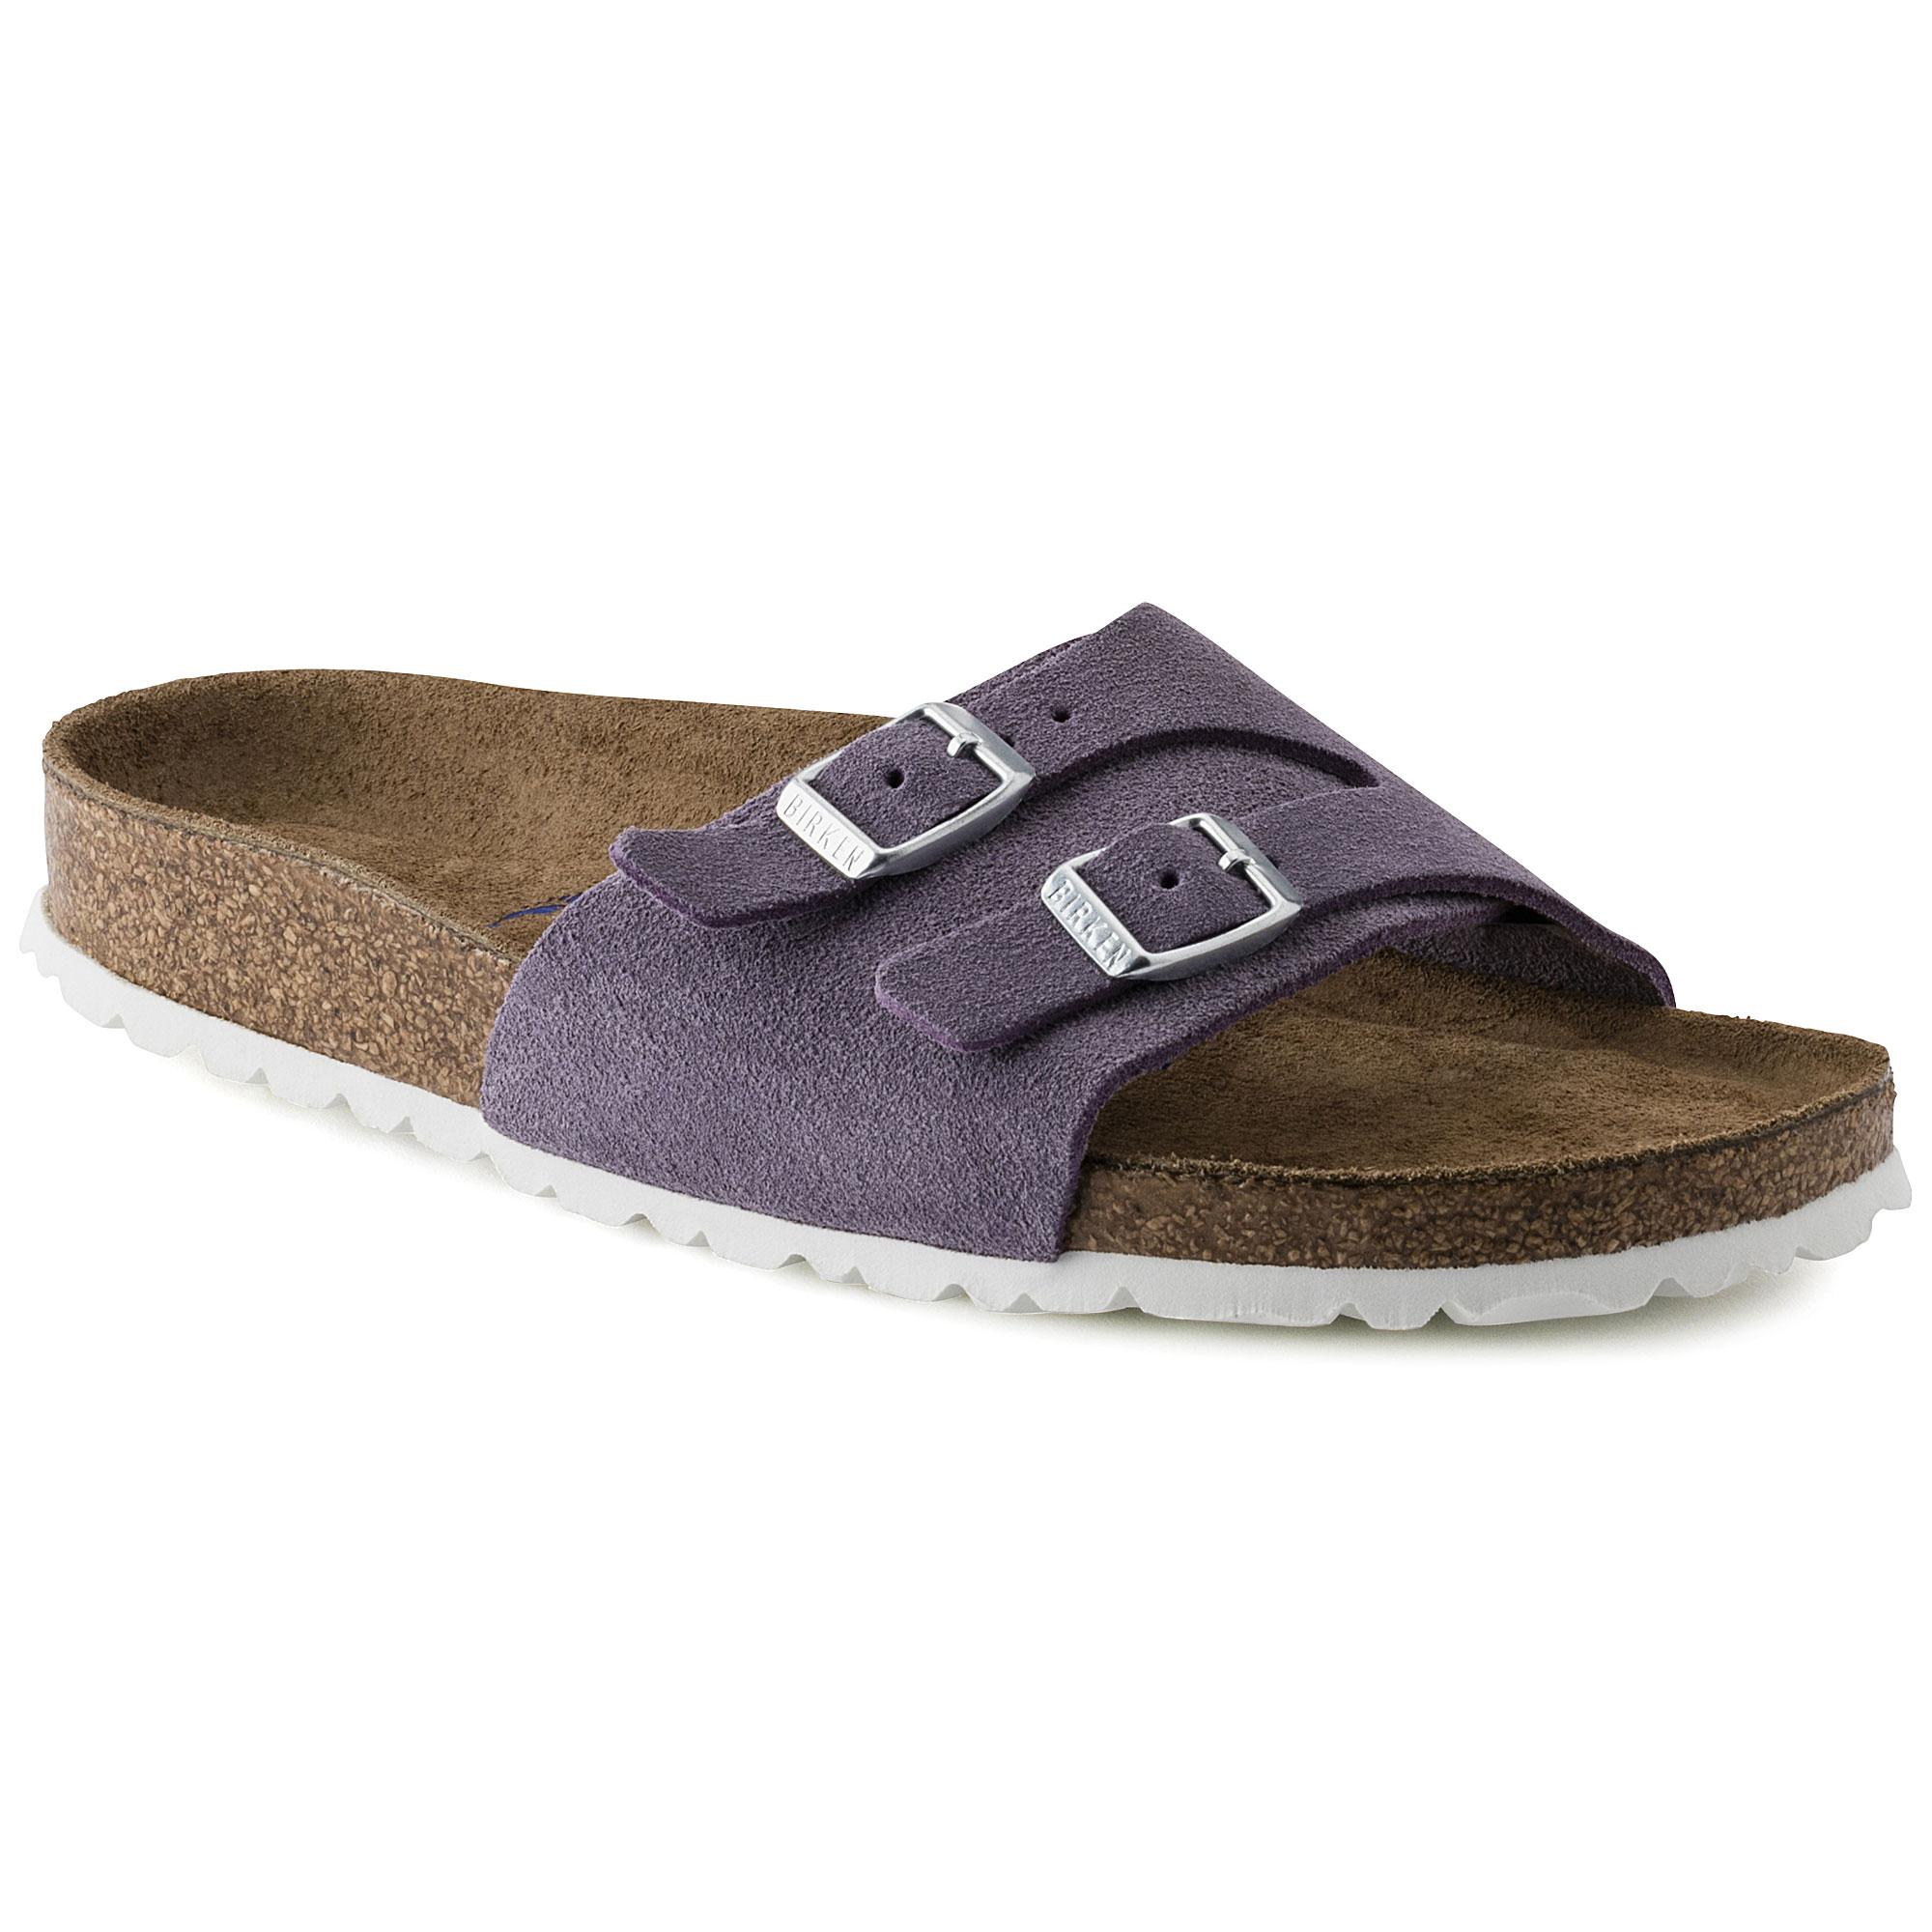 9ac4b1d28 Vaduz Suede Soft Footbed Lavender ...